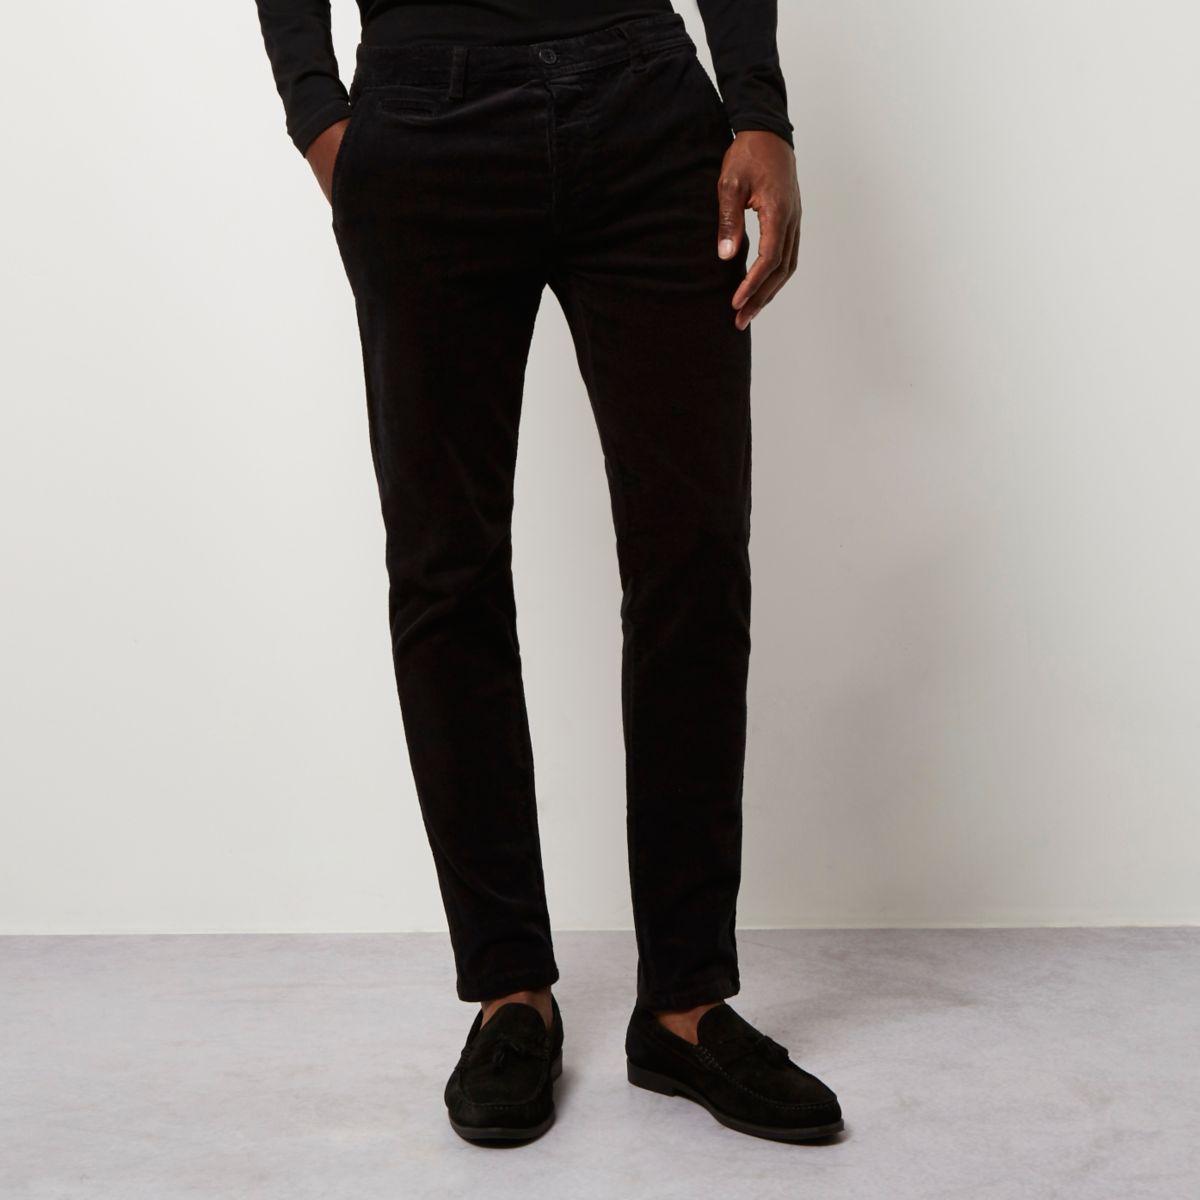 Pantalon chino skinny noir en velours côtelé